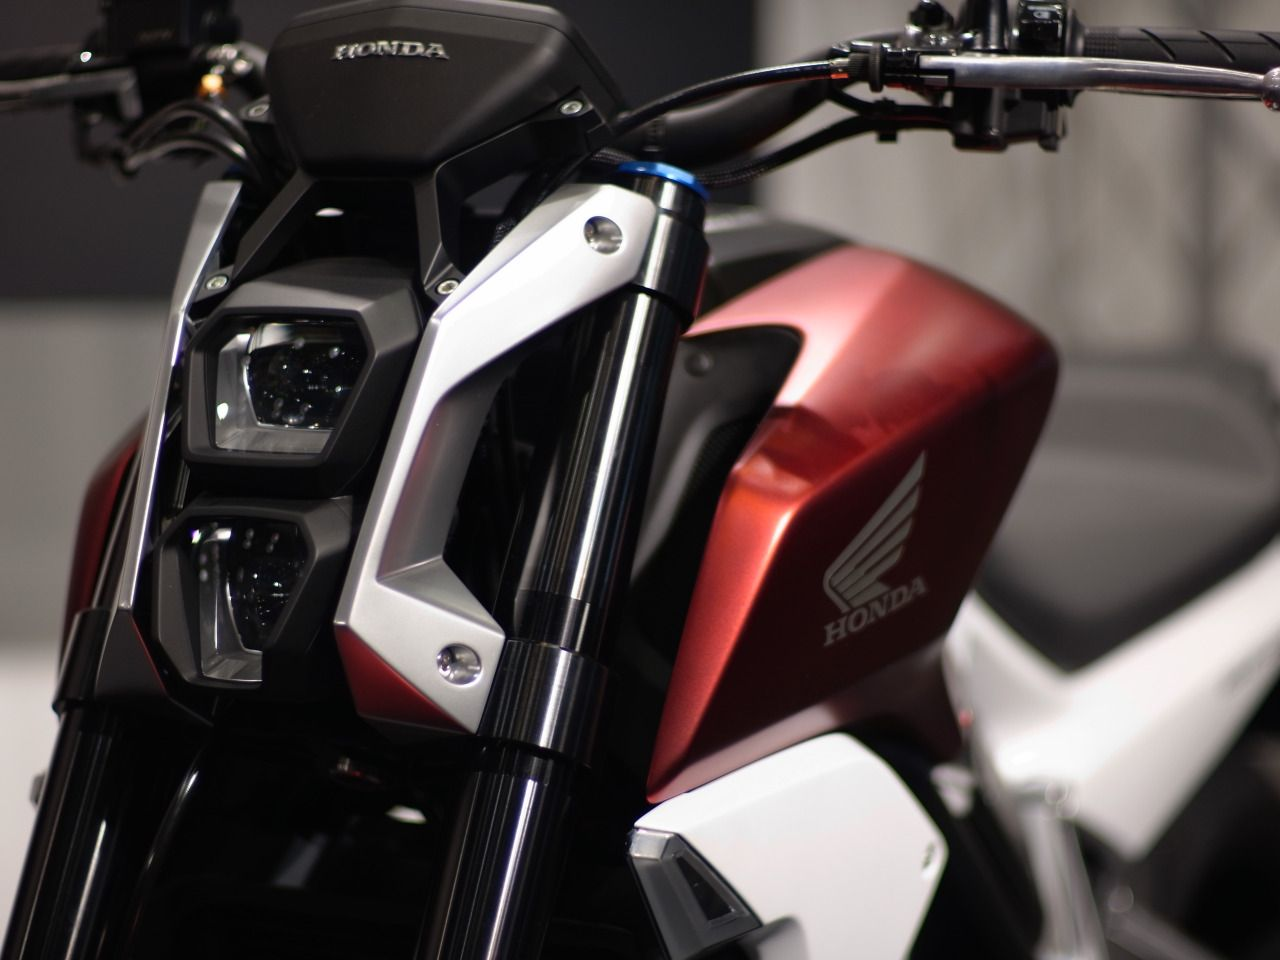 Sink00 | Motorbike | Pinterest | Motorcycle headlight, Wheels and ... for Bike Headlight Design  587fsj